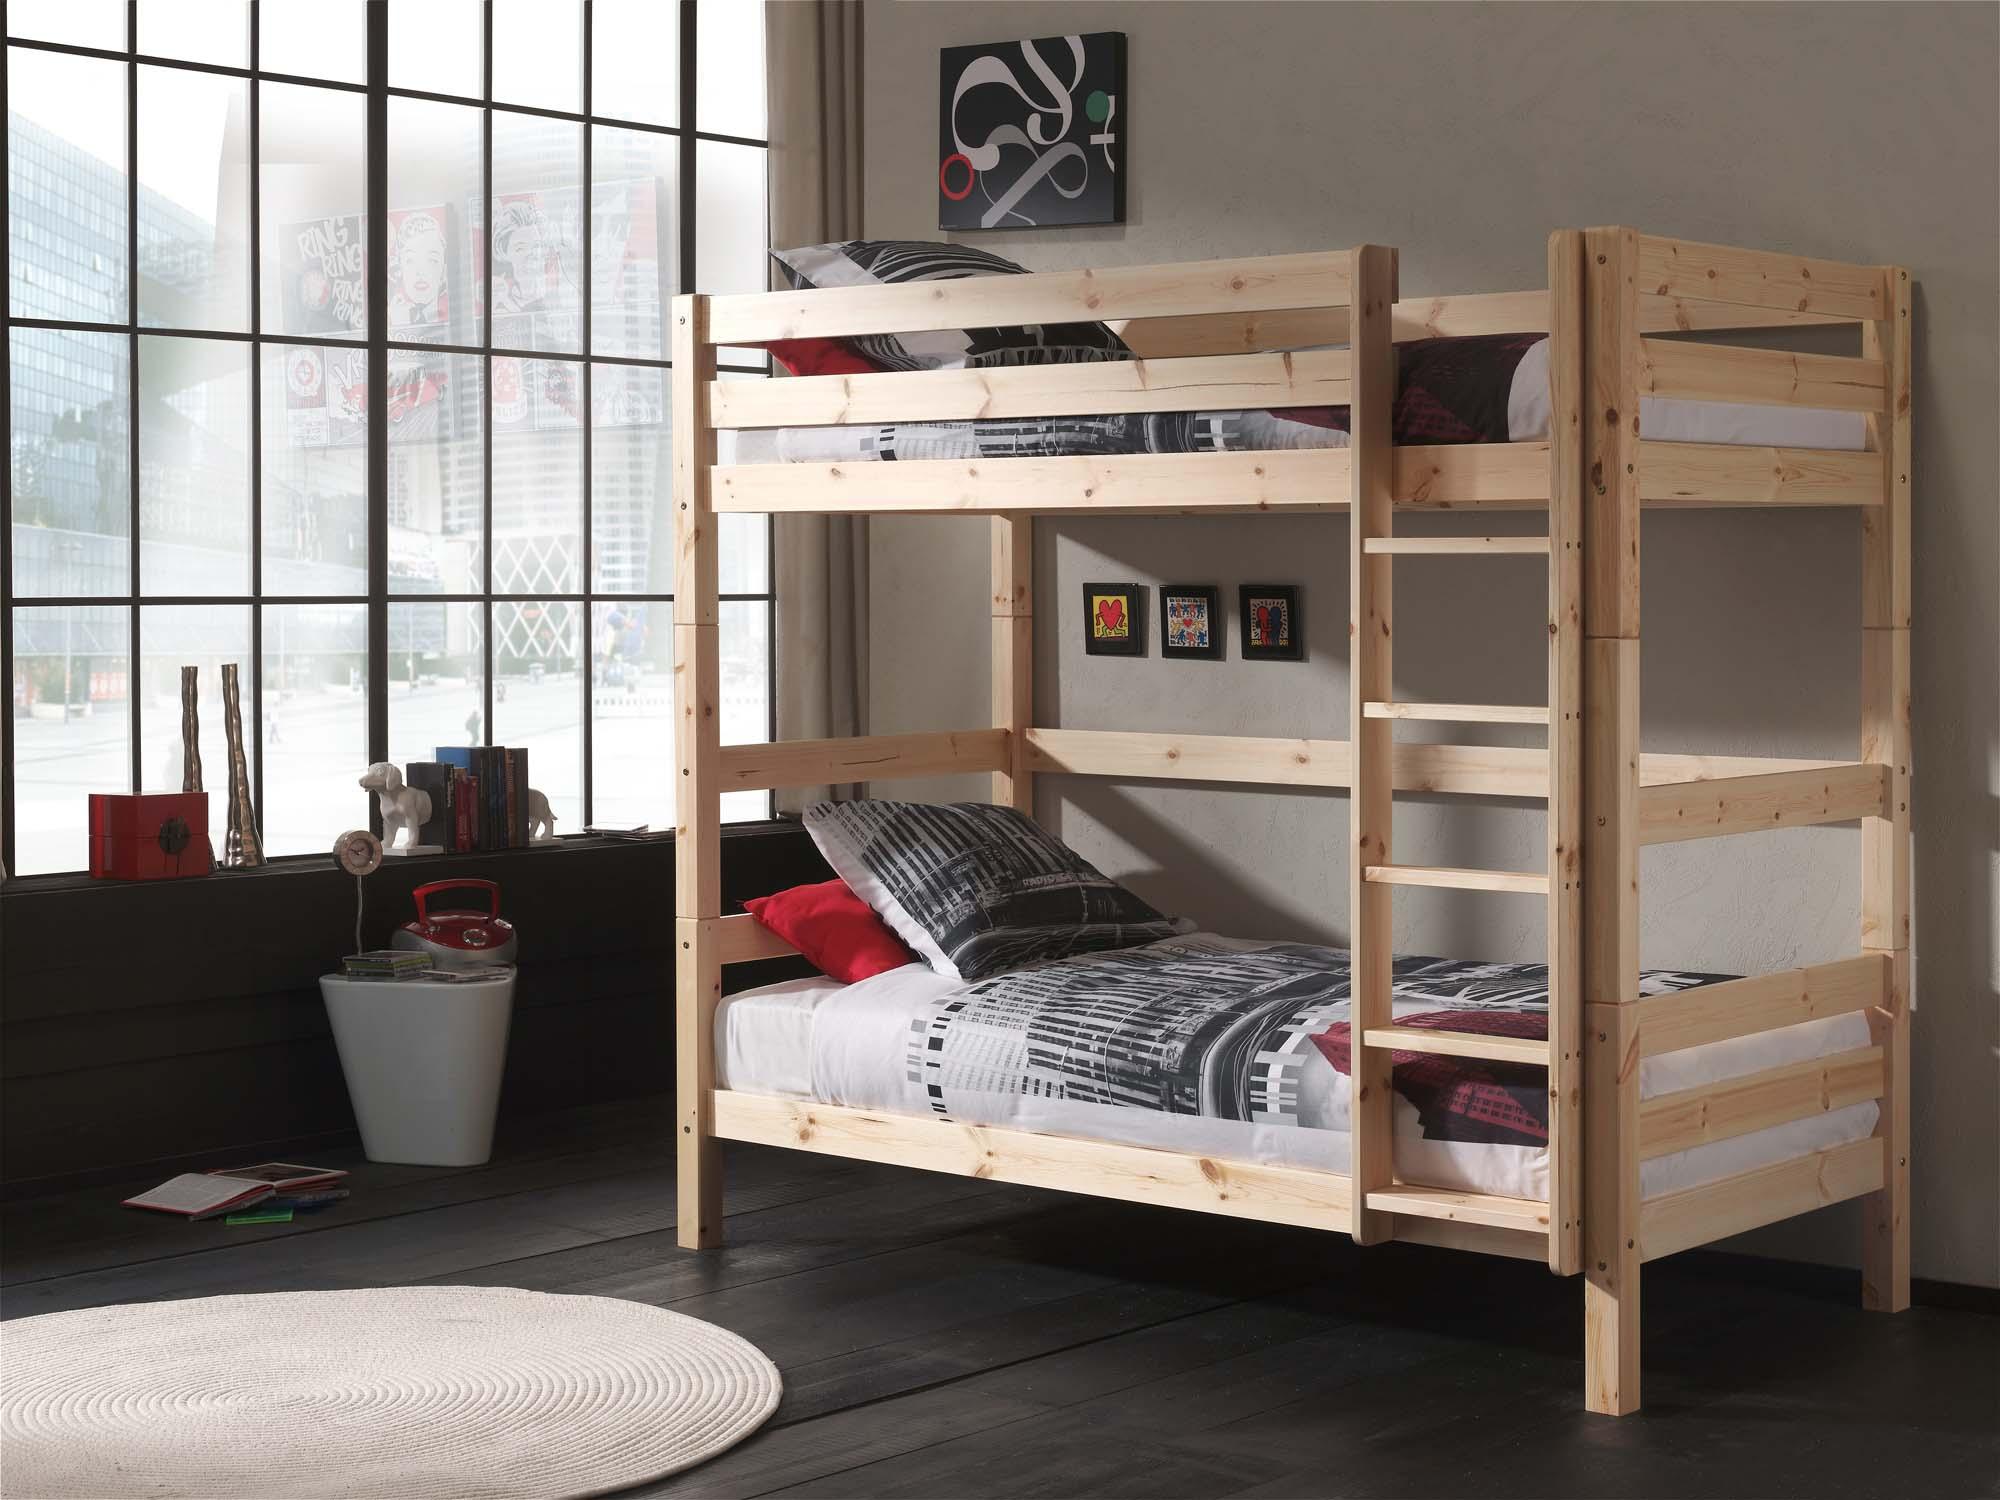 lits superpos s s parables tic tac couchage 90x200 cm sonuit. Black Bedroom Furniture Sets. Home Design Ideas